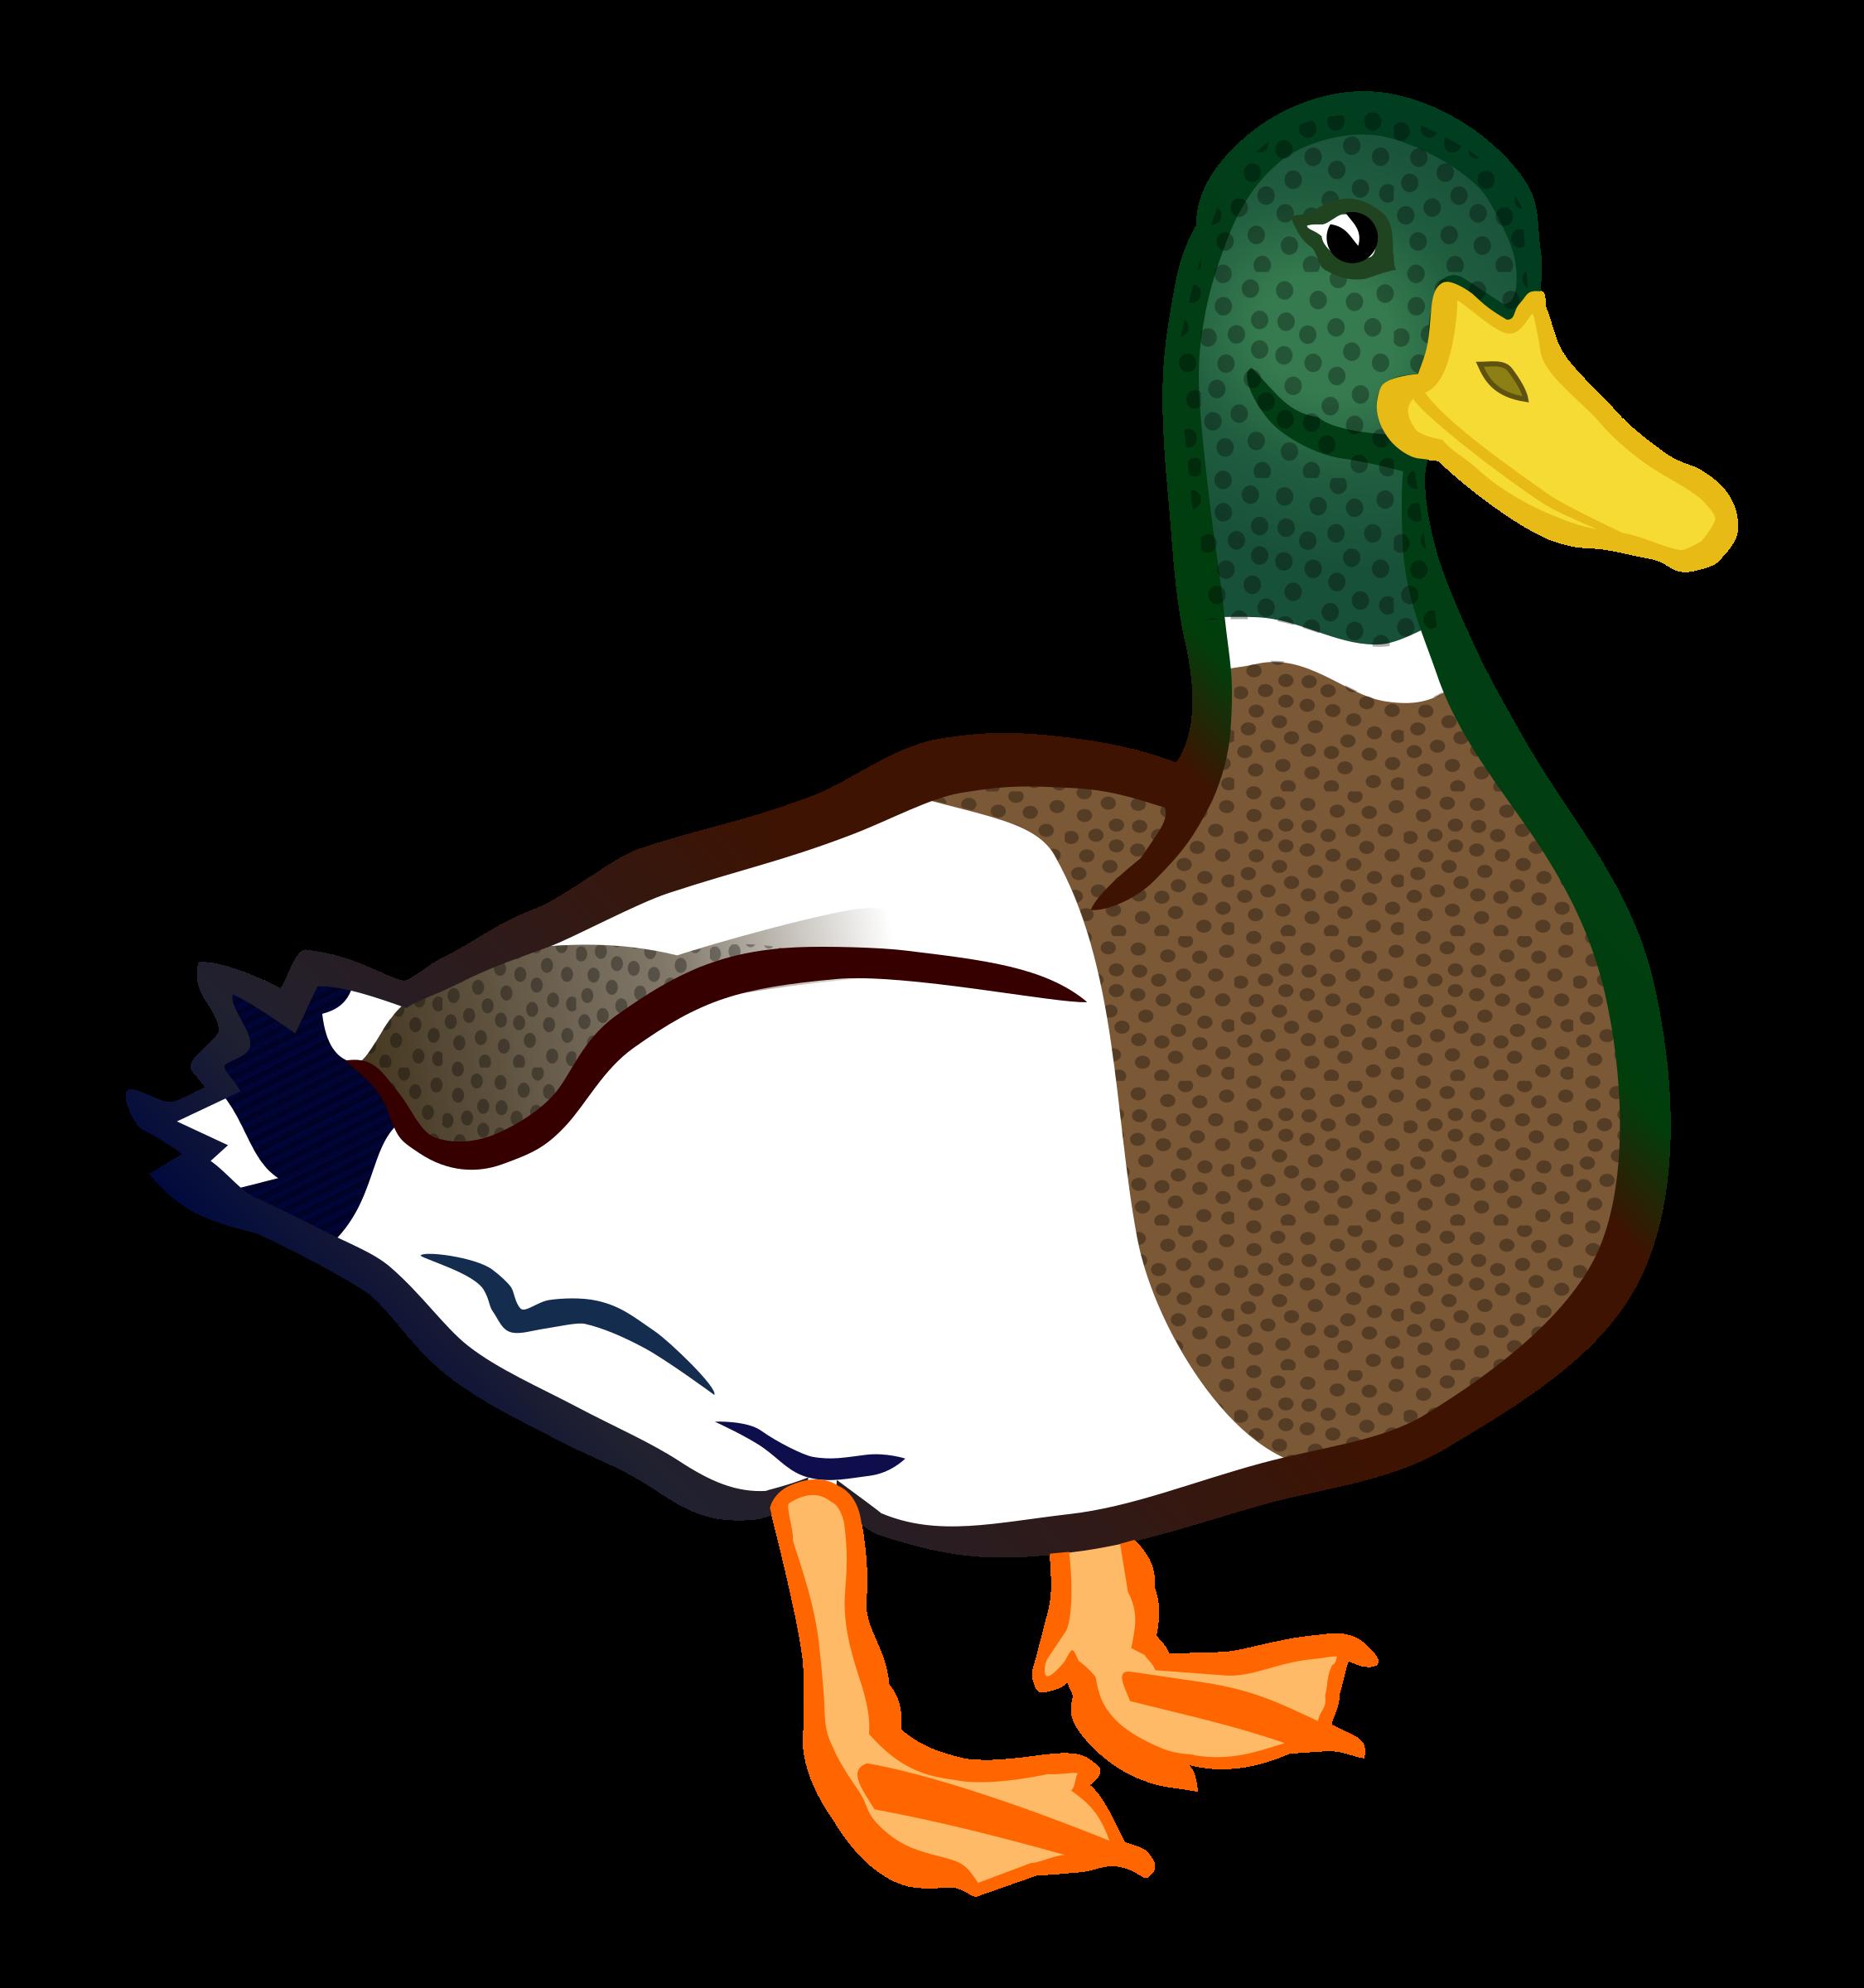 png transparent stock Logs clipart bird. Duck coloured big image.